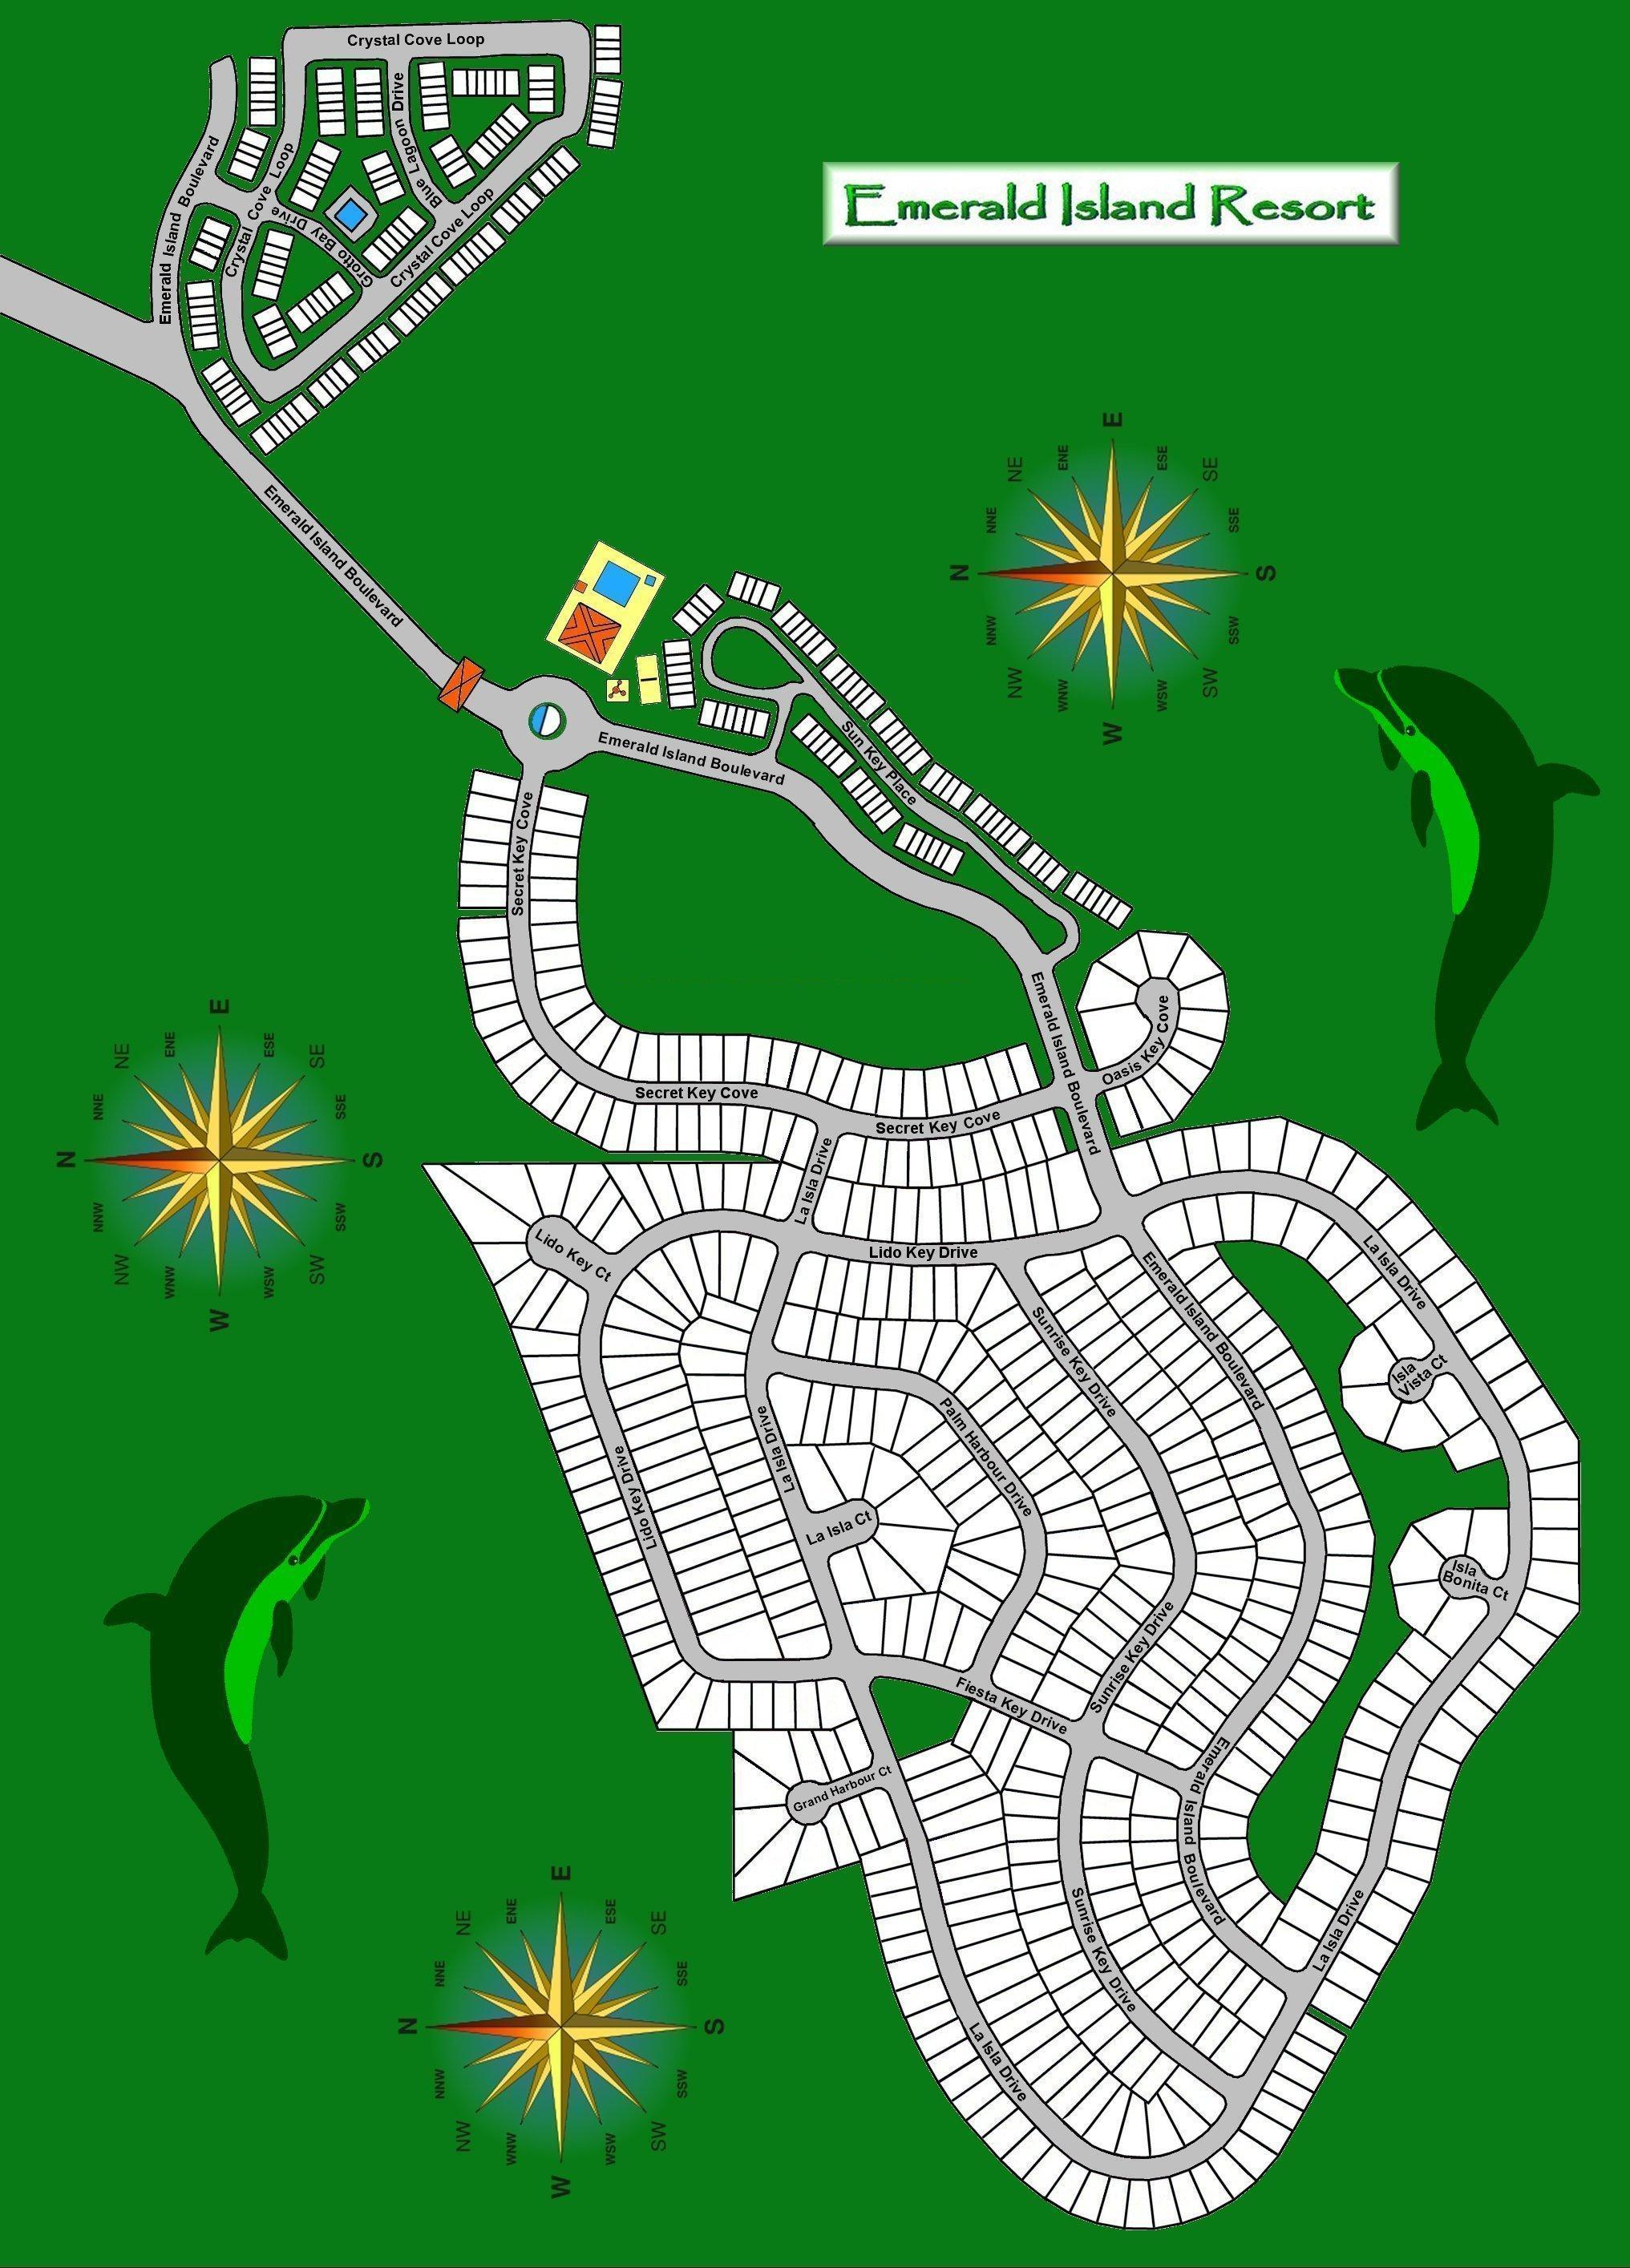 Emerald Island Resort Kissimmee Orlando Florida - Close To Disney Parks - Emerald Isle Florida Map